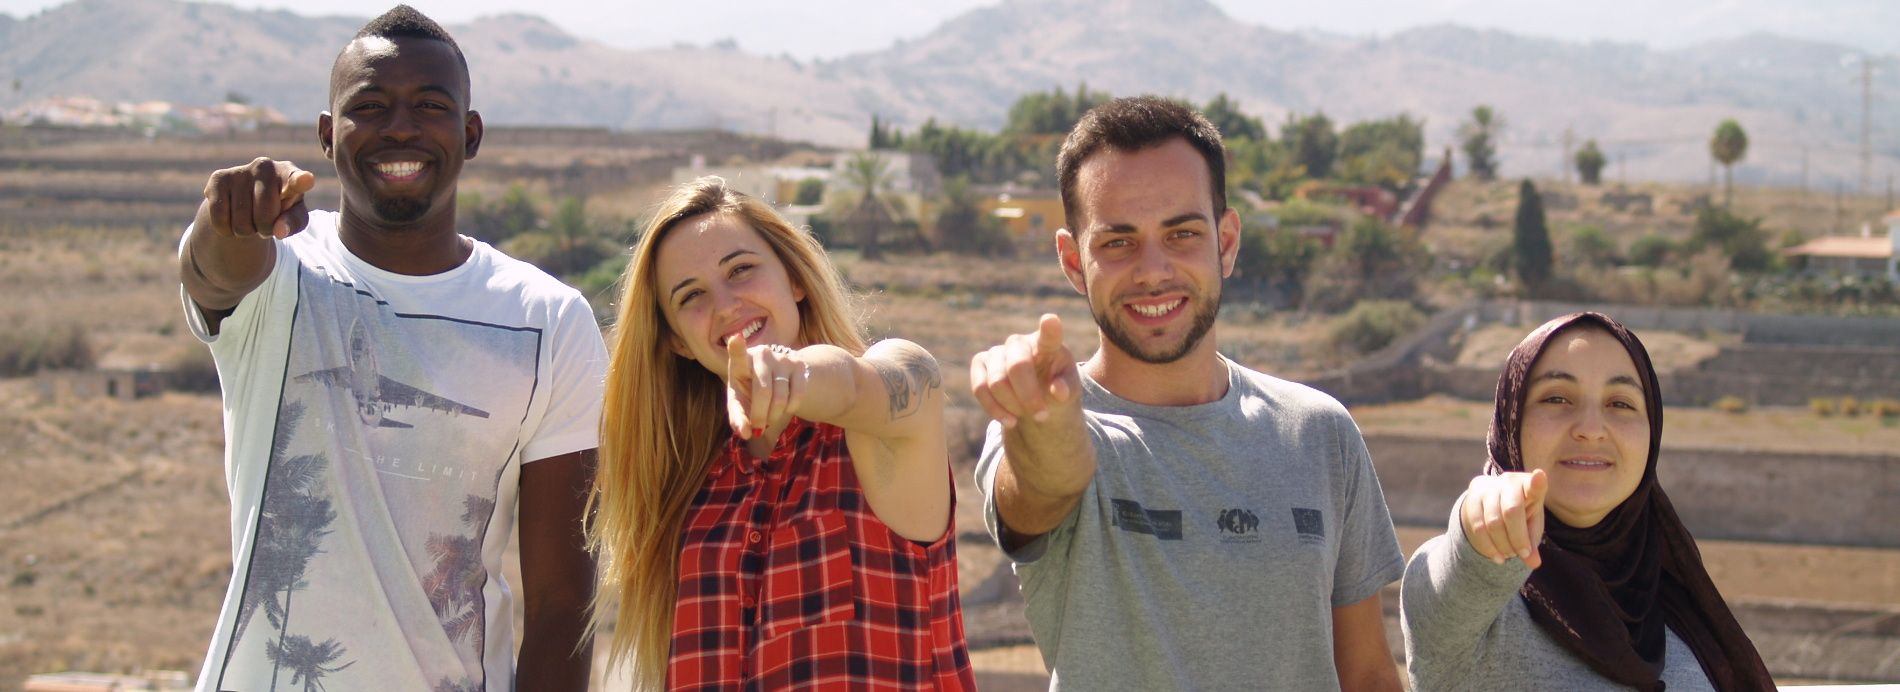 Fundación Canaria Main